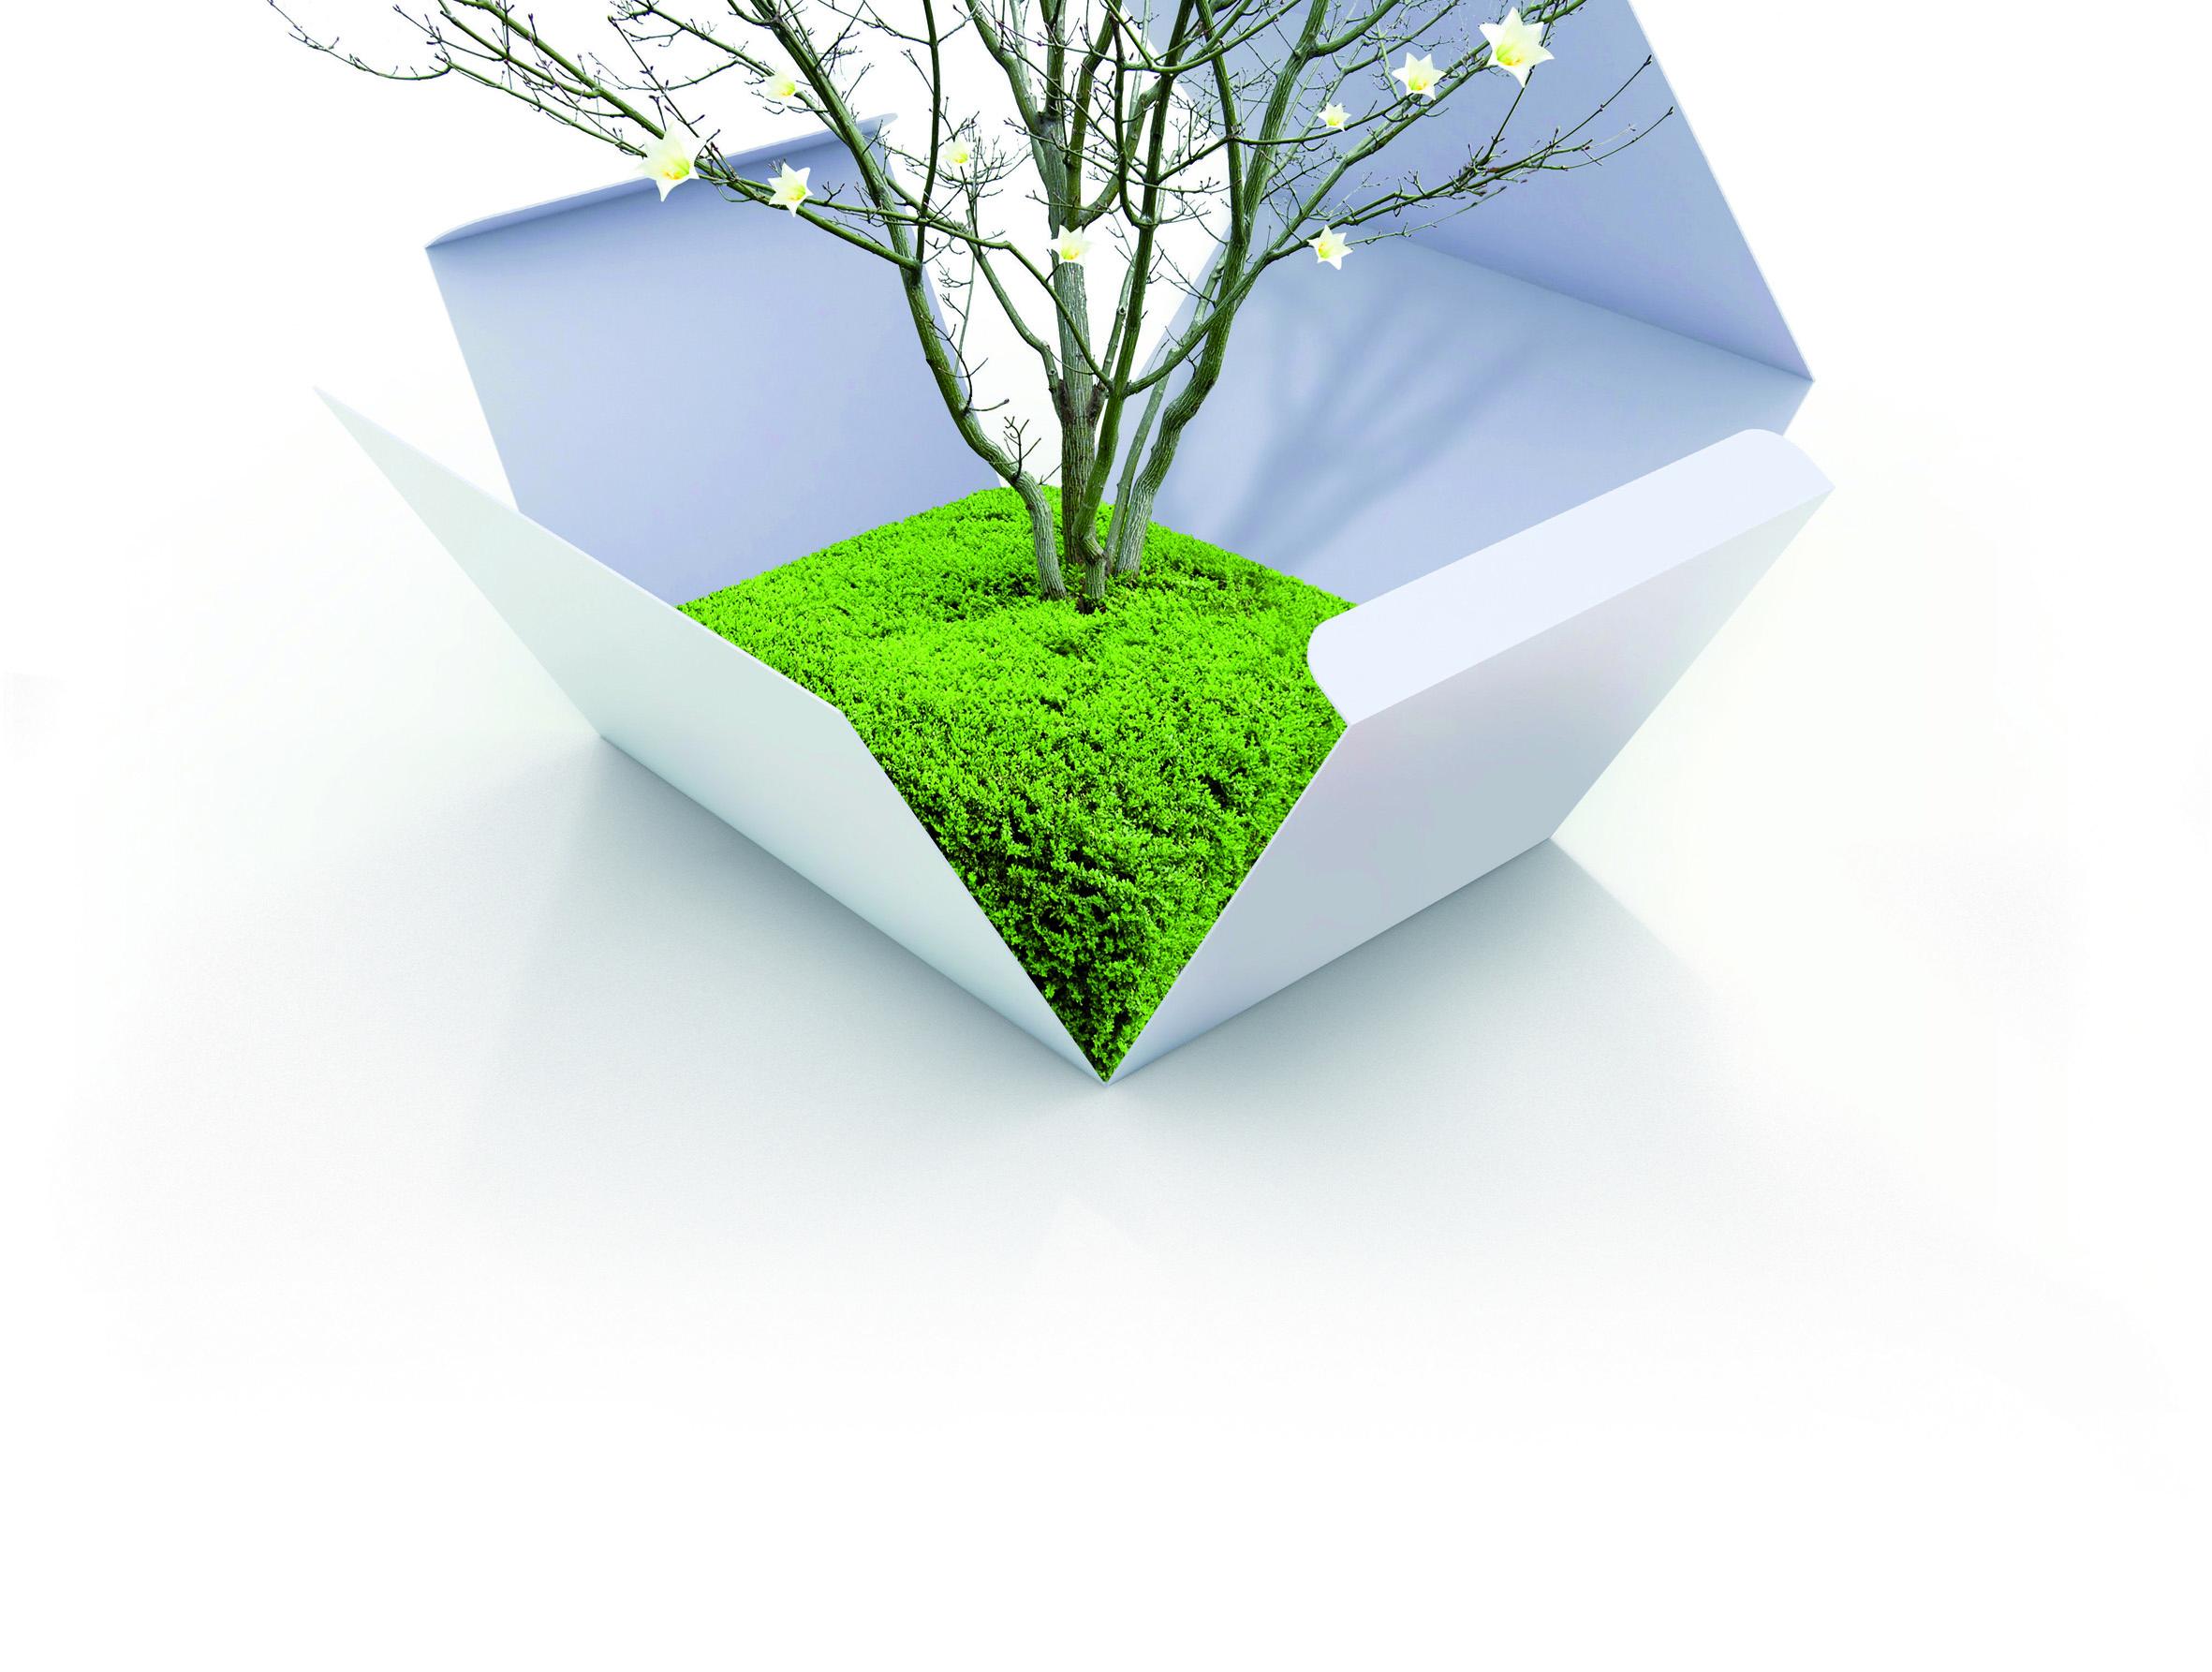 Mayr-Melnhof Karton